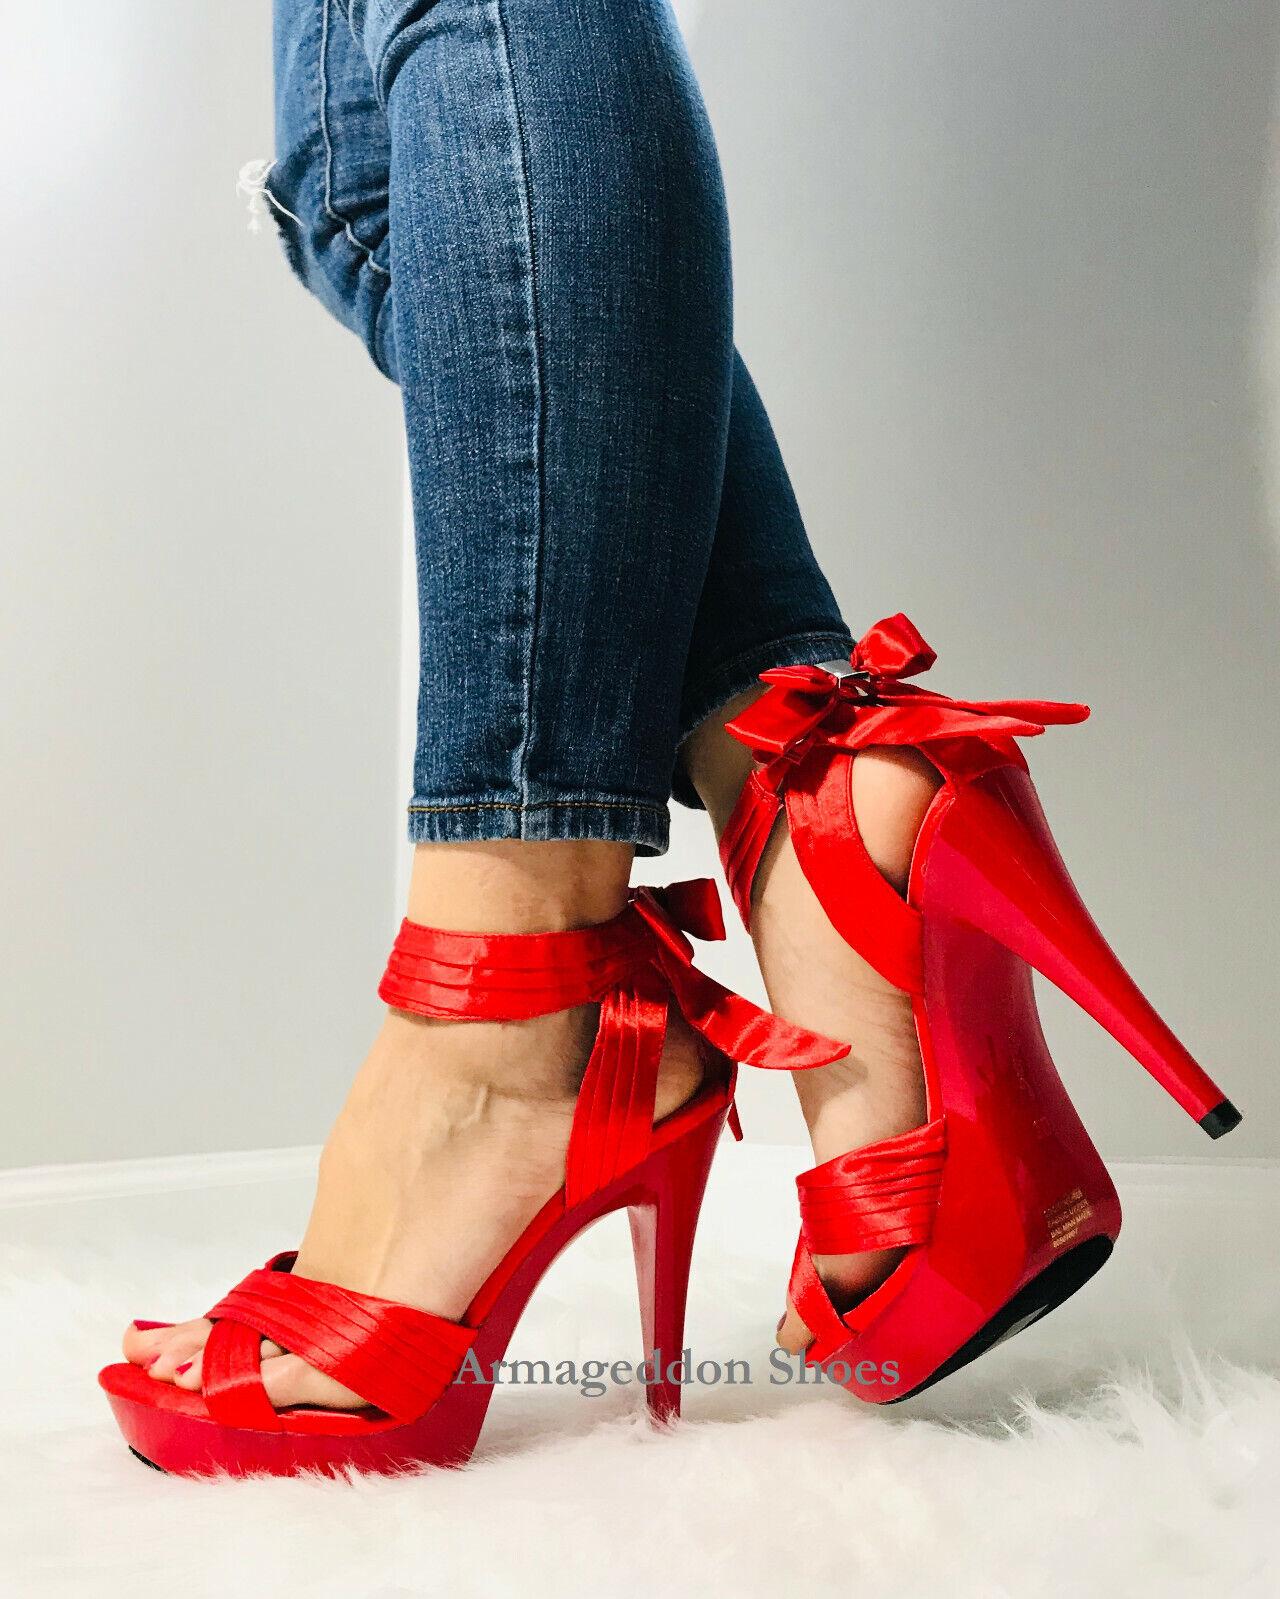 Nude Cream Satin Bridesmaid Bridesmaid Bridesmaid Heels Salsa Ballroom Dance shoes Womans 7 8 9 10 11 a88b24